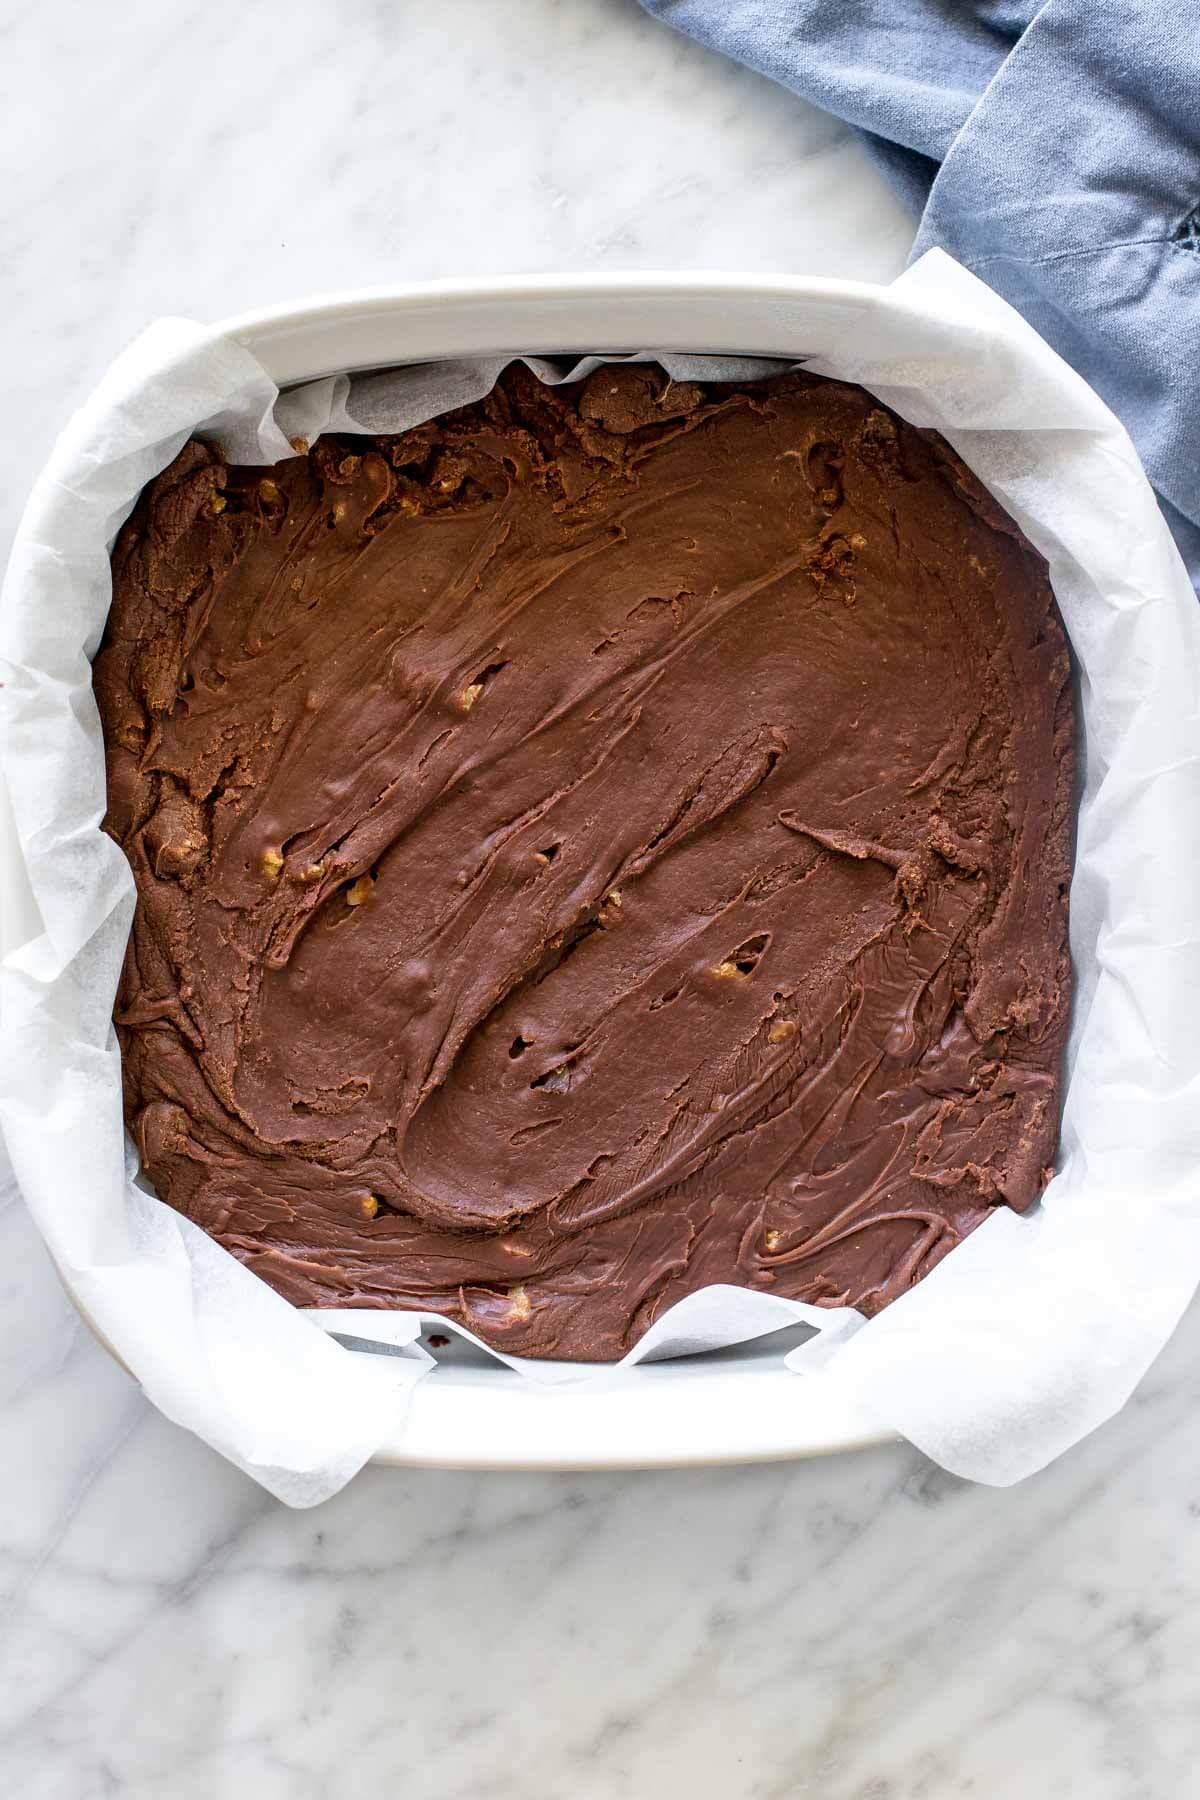 Pam of chocolate walnut fudge.